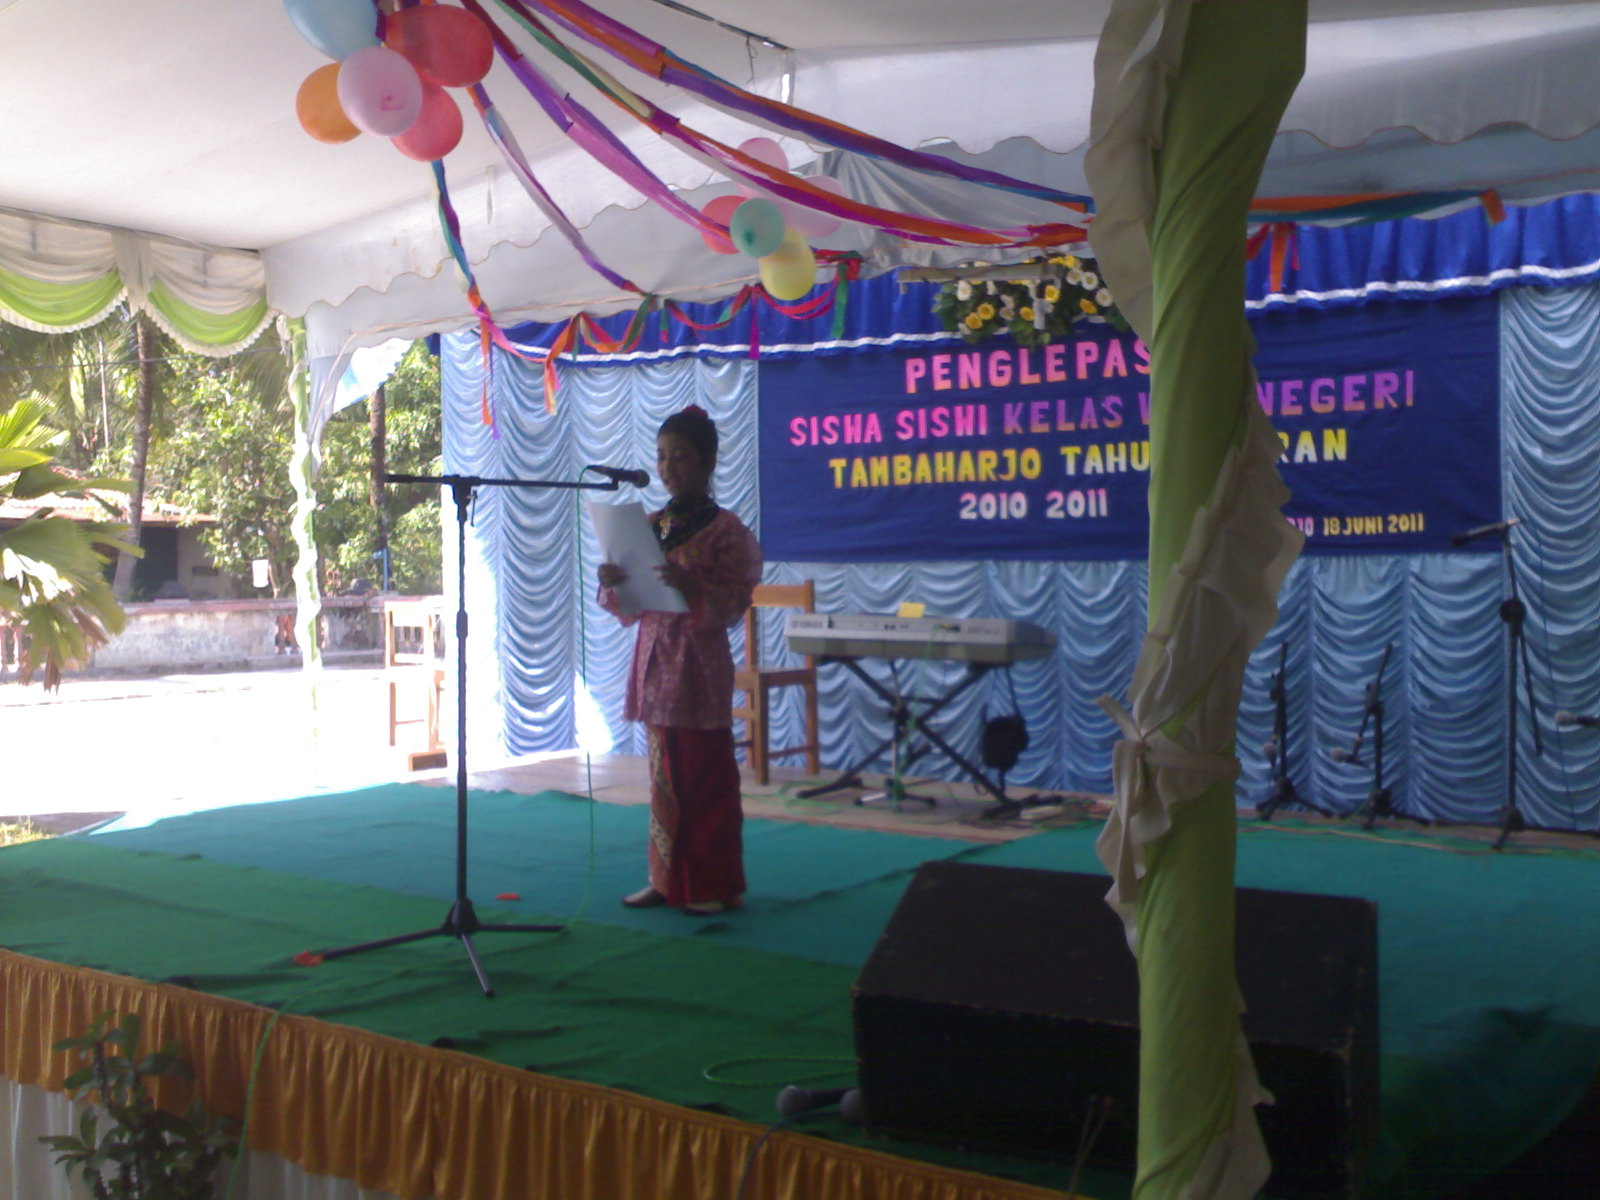 Info mengenai Pidato Perpisahan Kelas 6 Bahasa Jawa Krama | Healthy